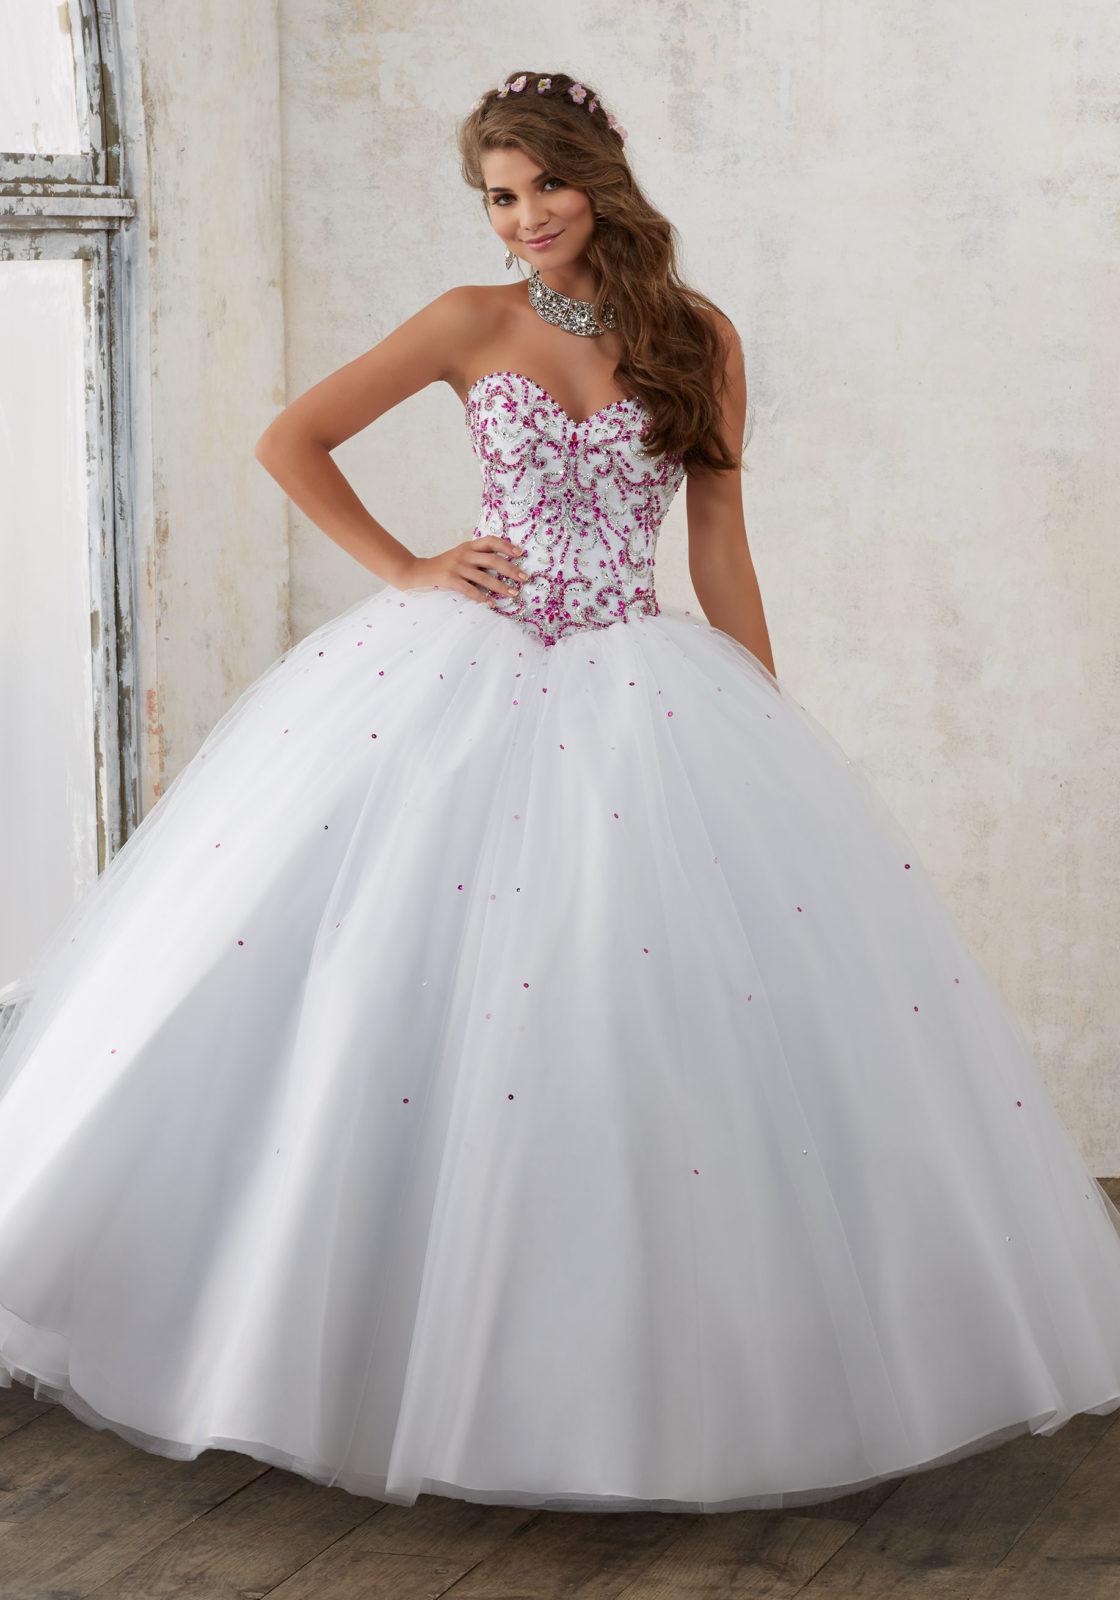 quinceanera wedding dresses photo - 1